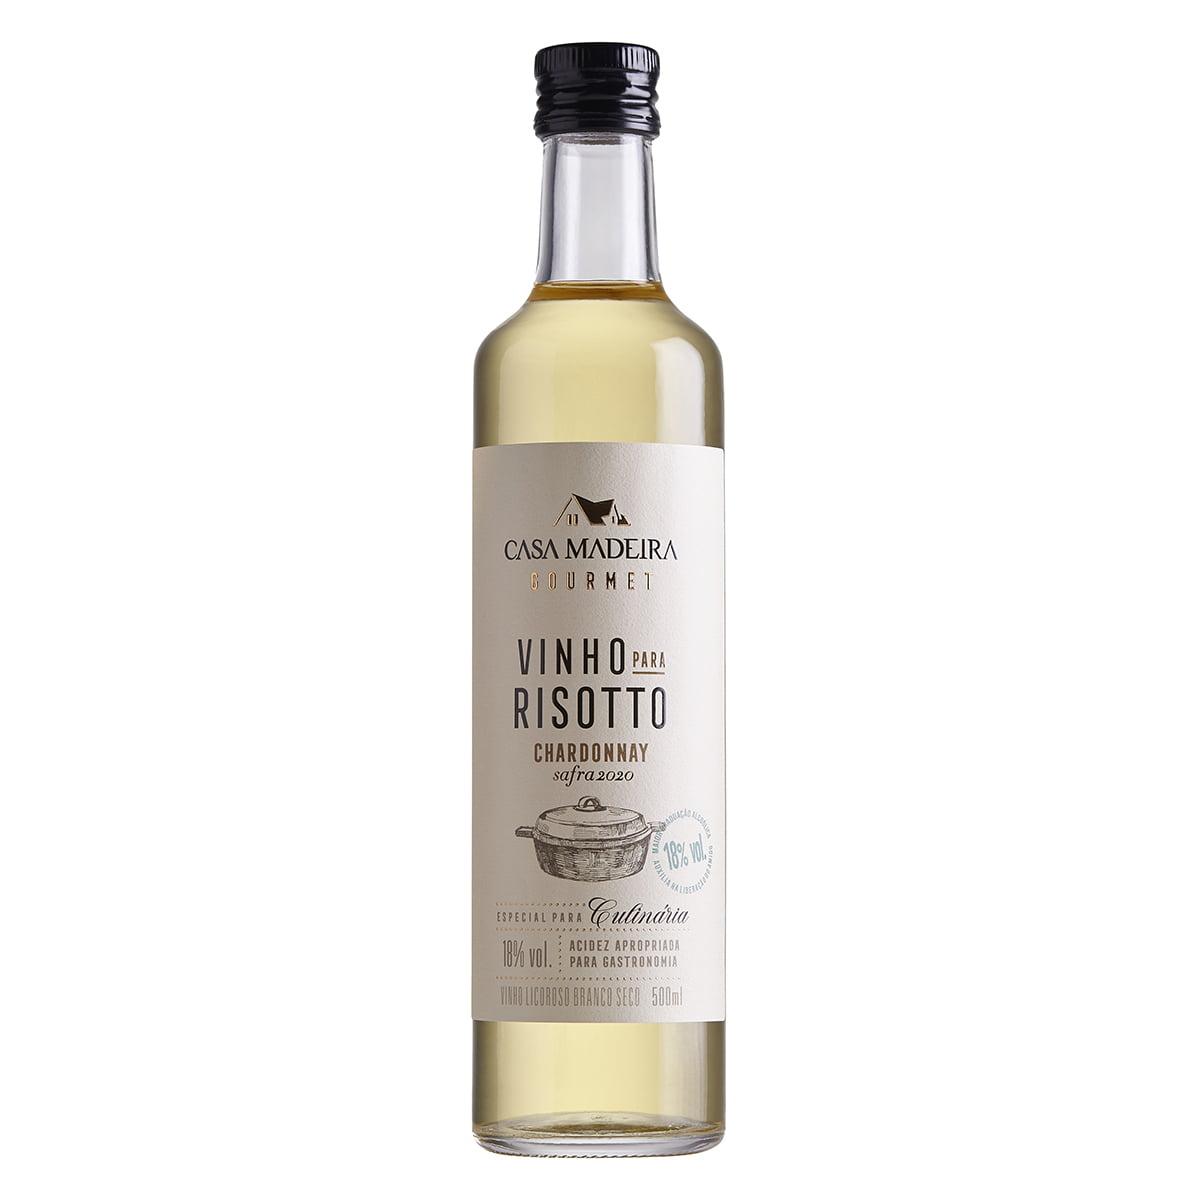 Vinho para Risotto Casa Madeira Licoroso Chardonnay 500ml